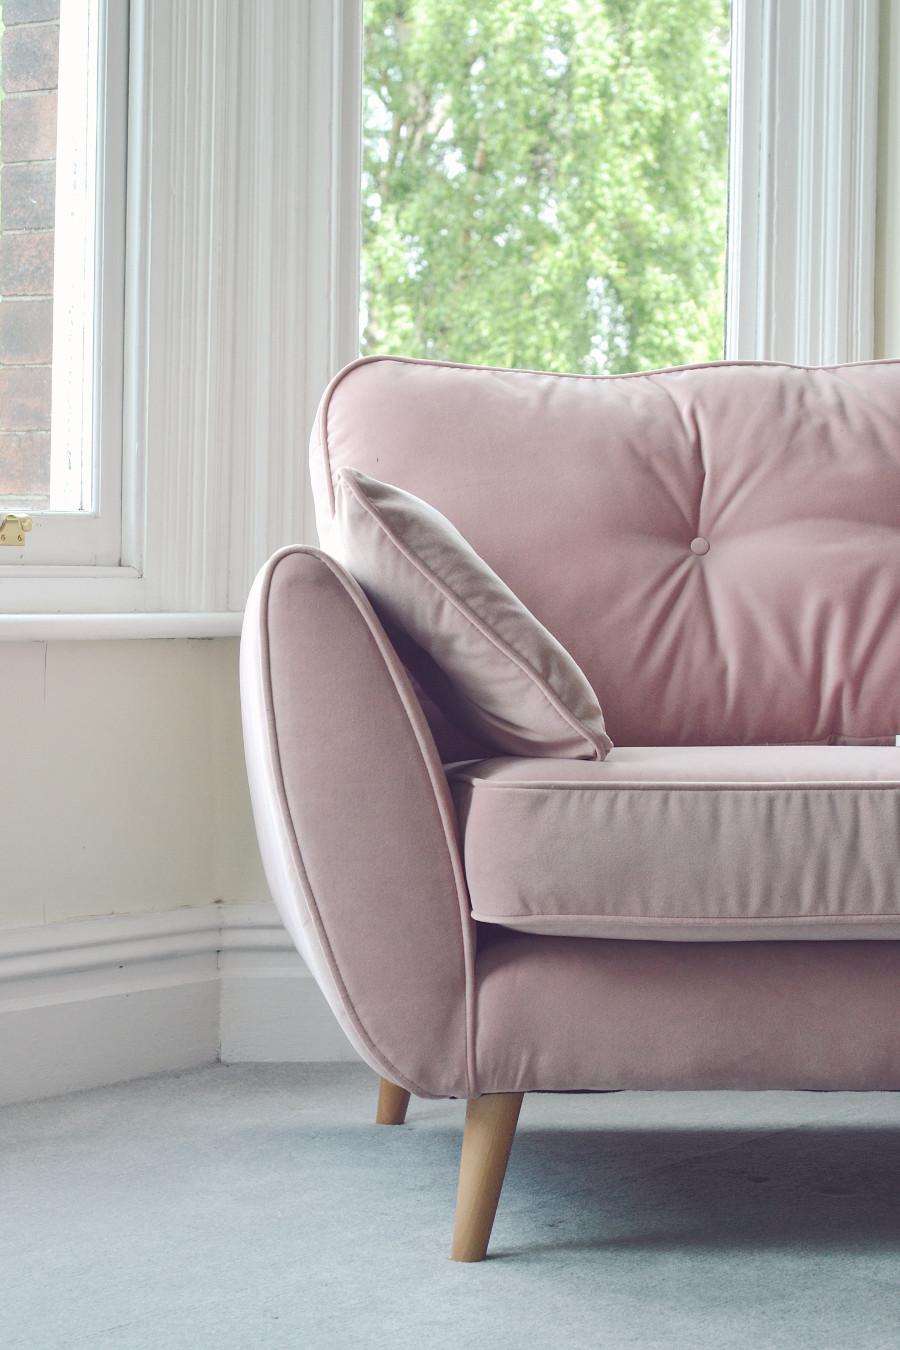 Dfs French Connection Quartz Sofa Review Armrest Tray India Zinc Reviews Blog Avie Slate Wia